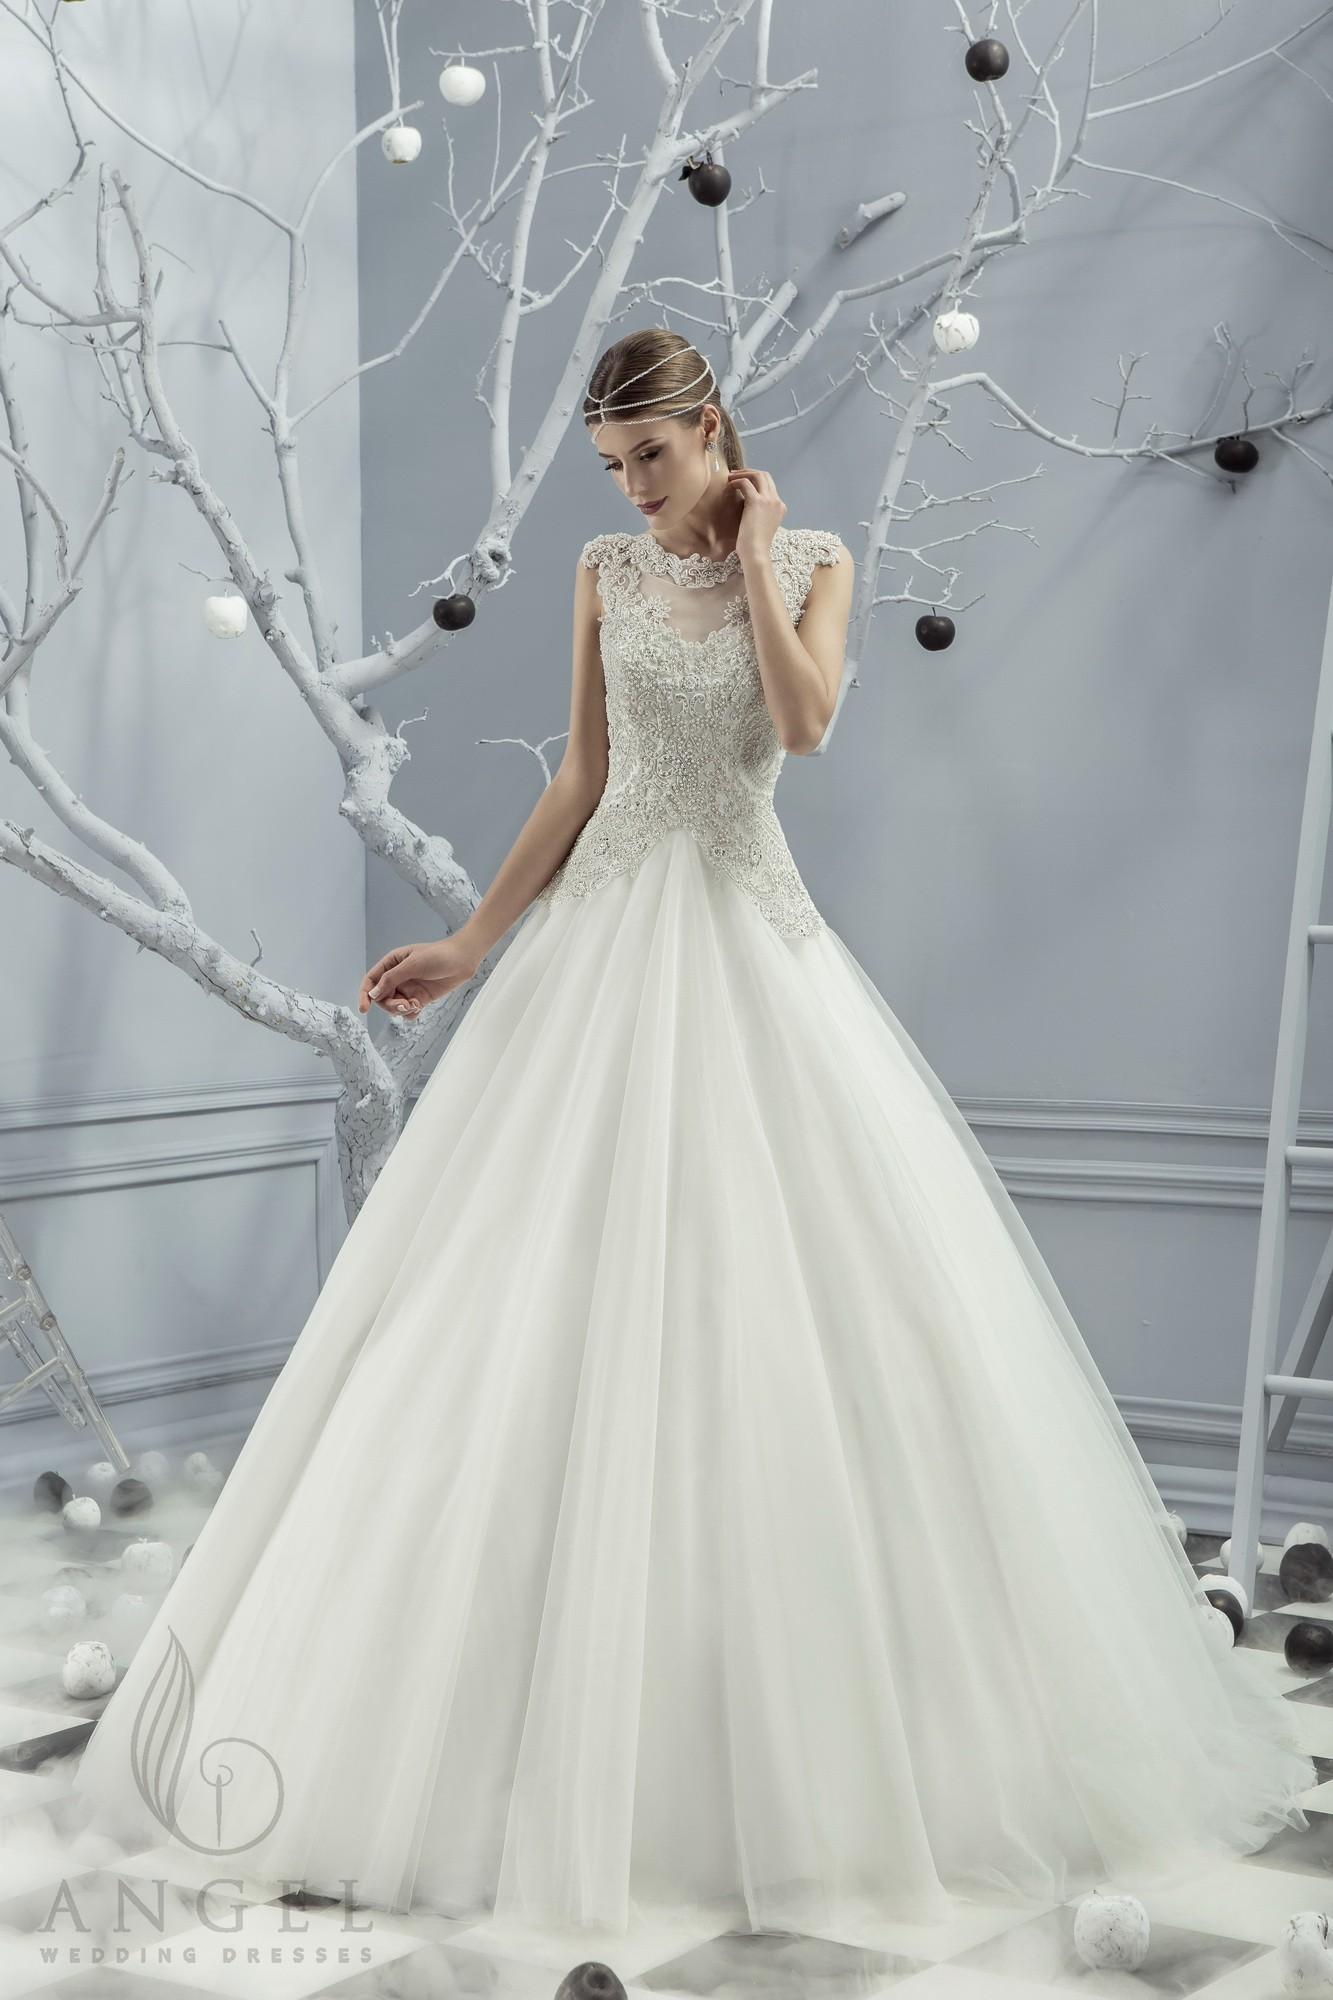 https://angel-novias.com/images/stories/virtuemart/product/Lisbeth.jpg